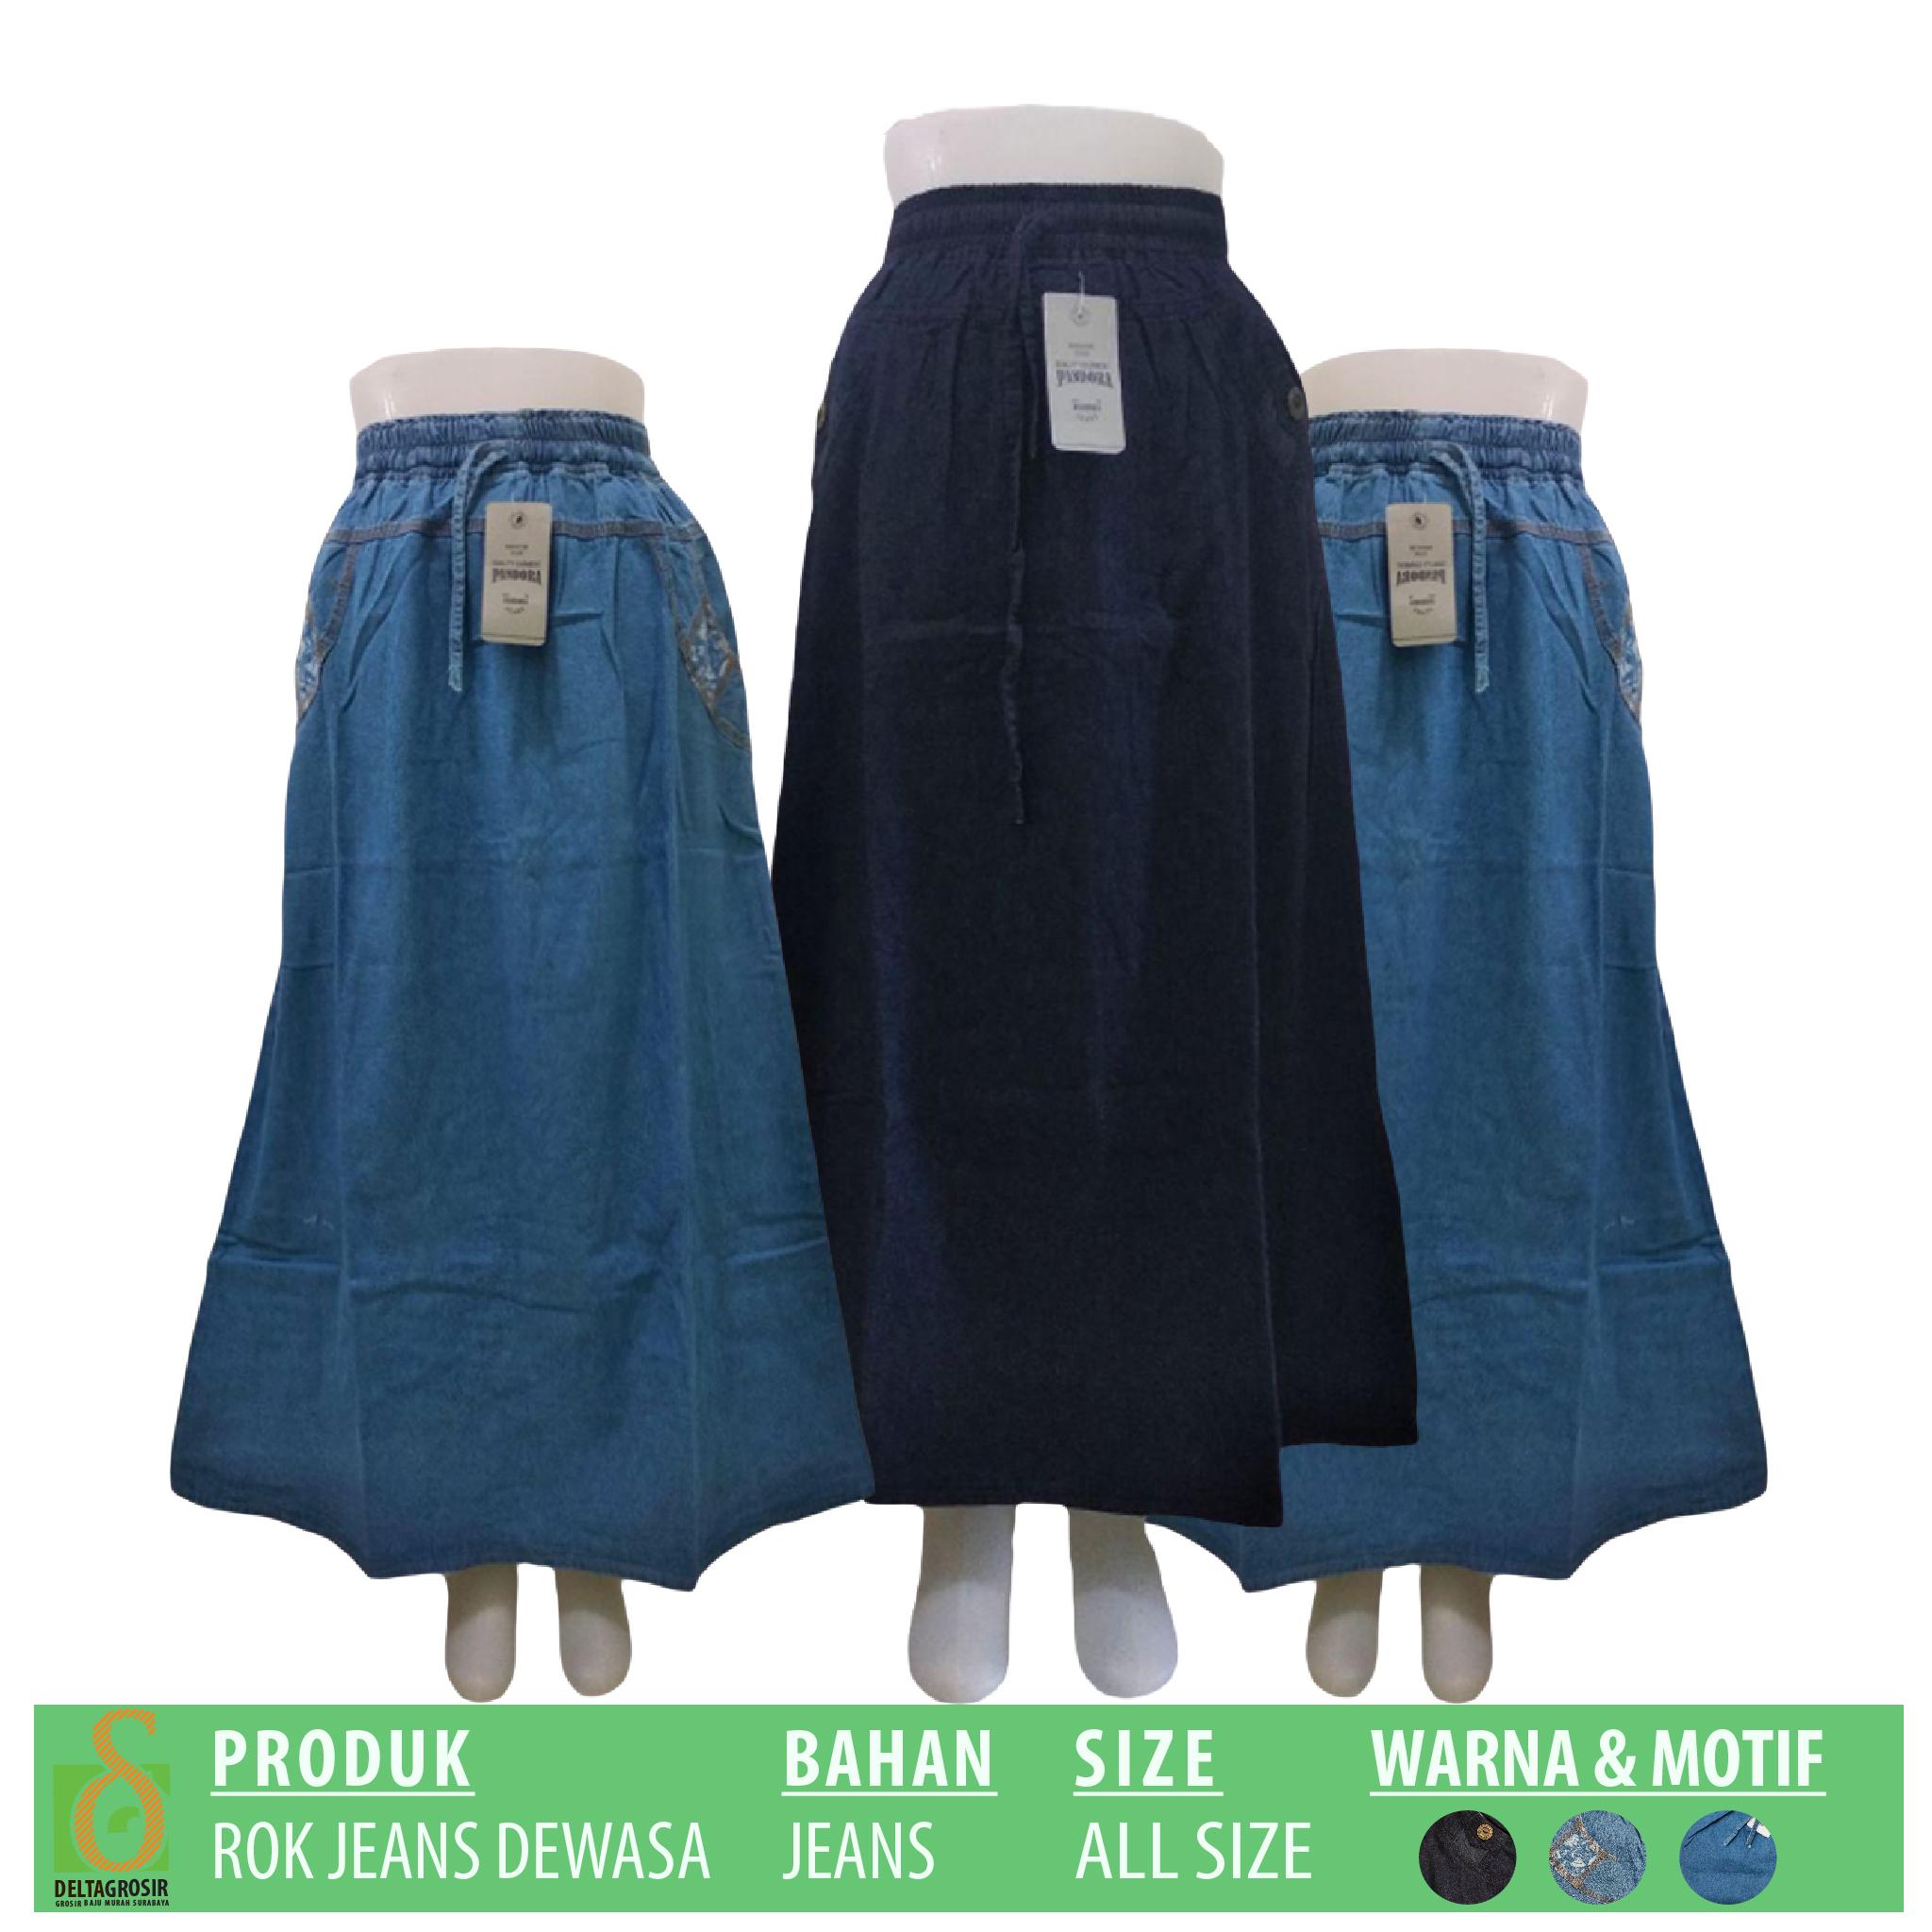 Supplier Rok Jeans Dewasa Murah 51ribuan